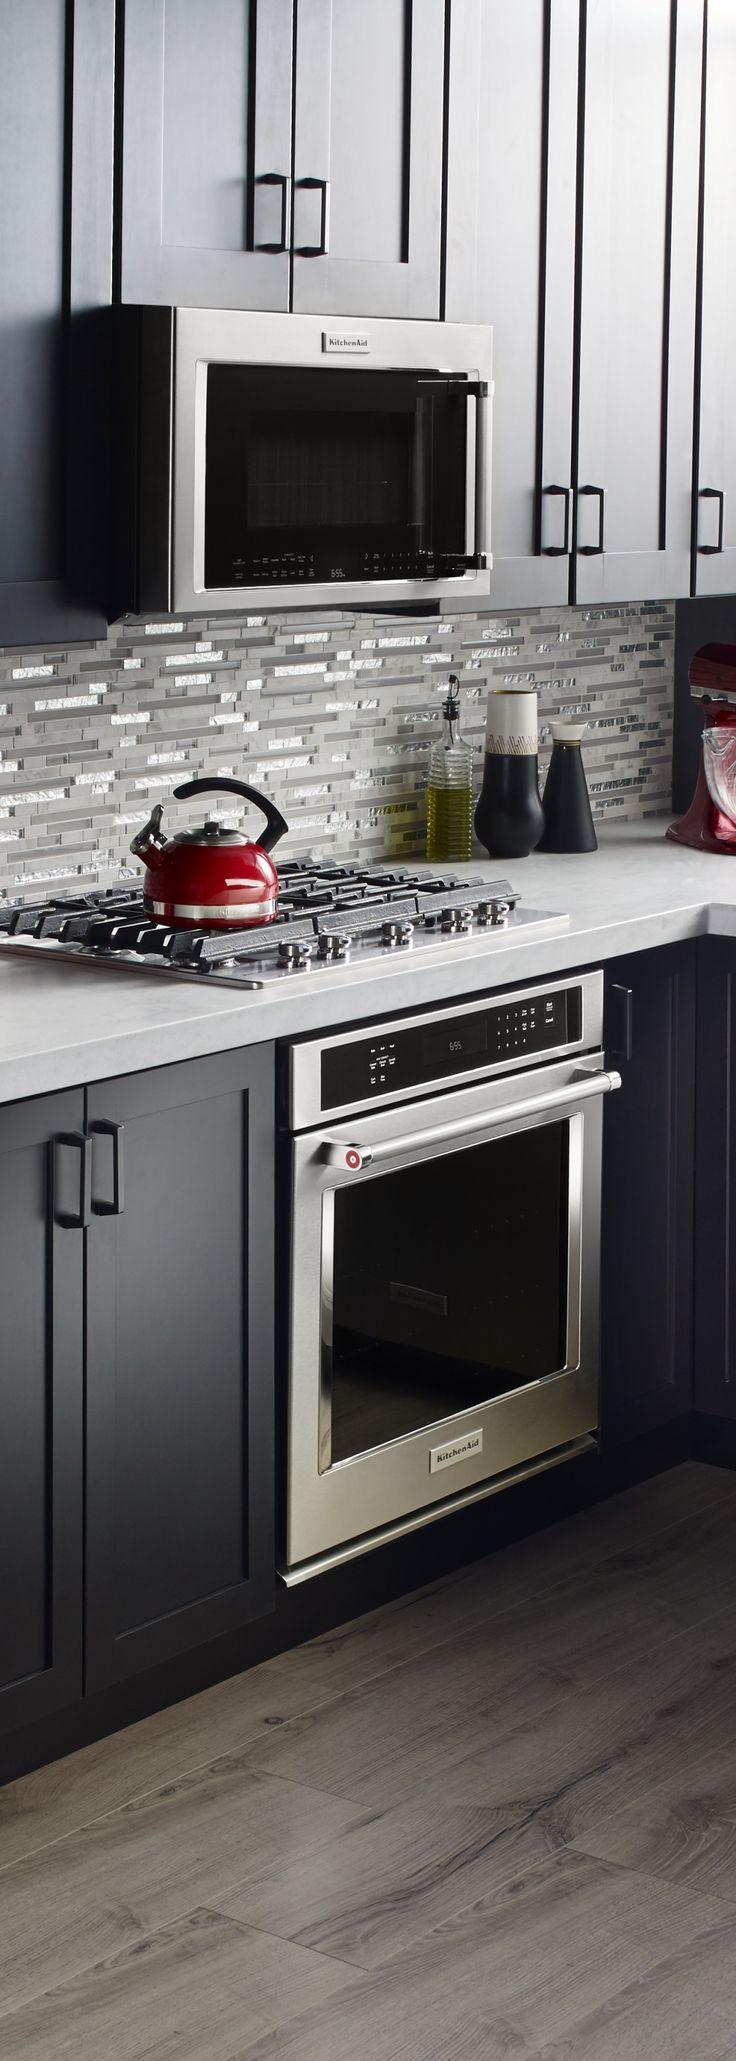 Ensure even consistent baking with kitchenaids evenheat